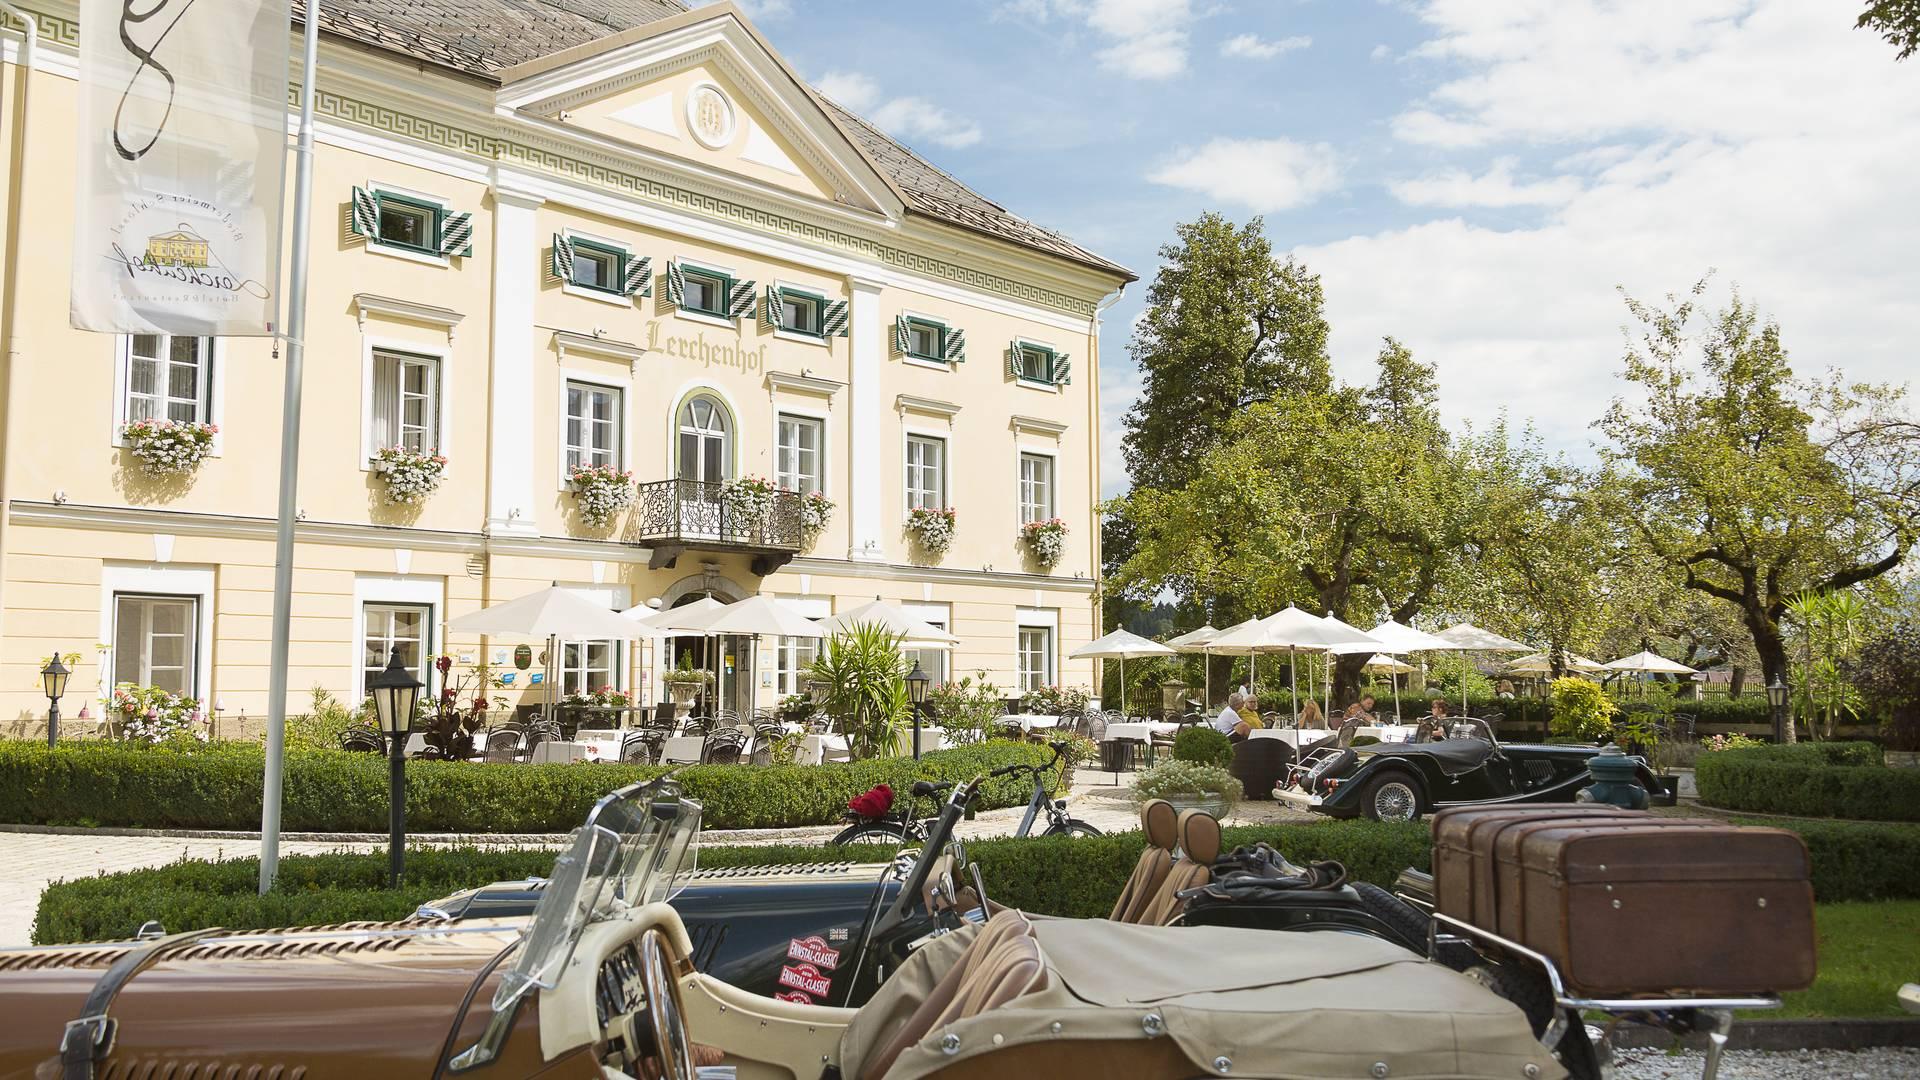 Cabriohotel Schloss Lerchenhof Hermagor